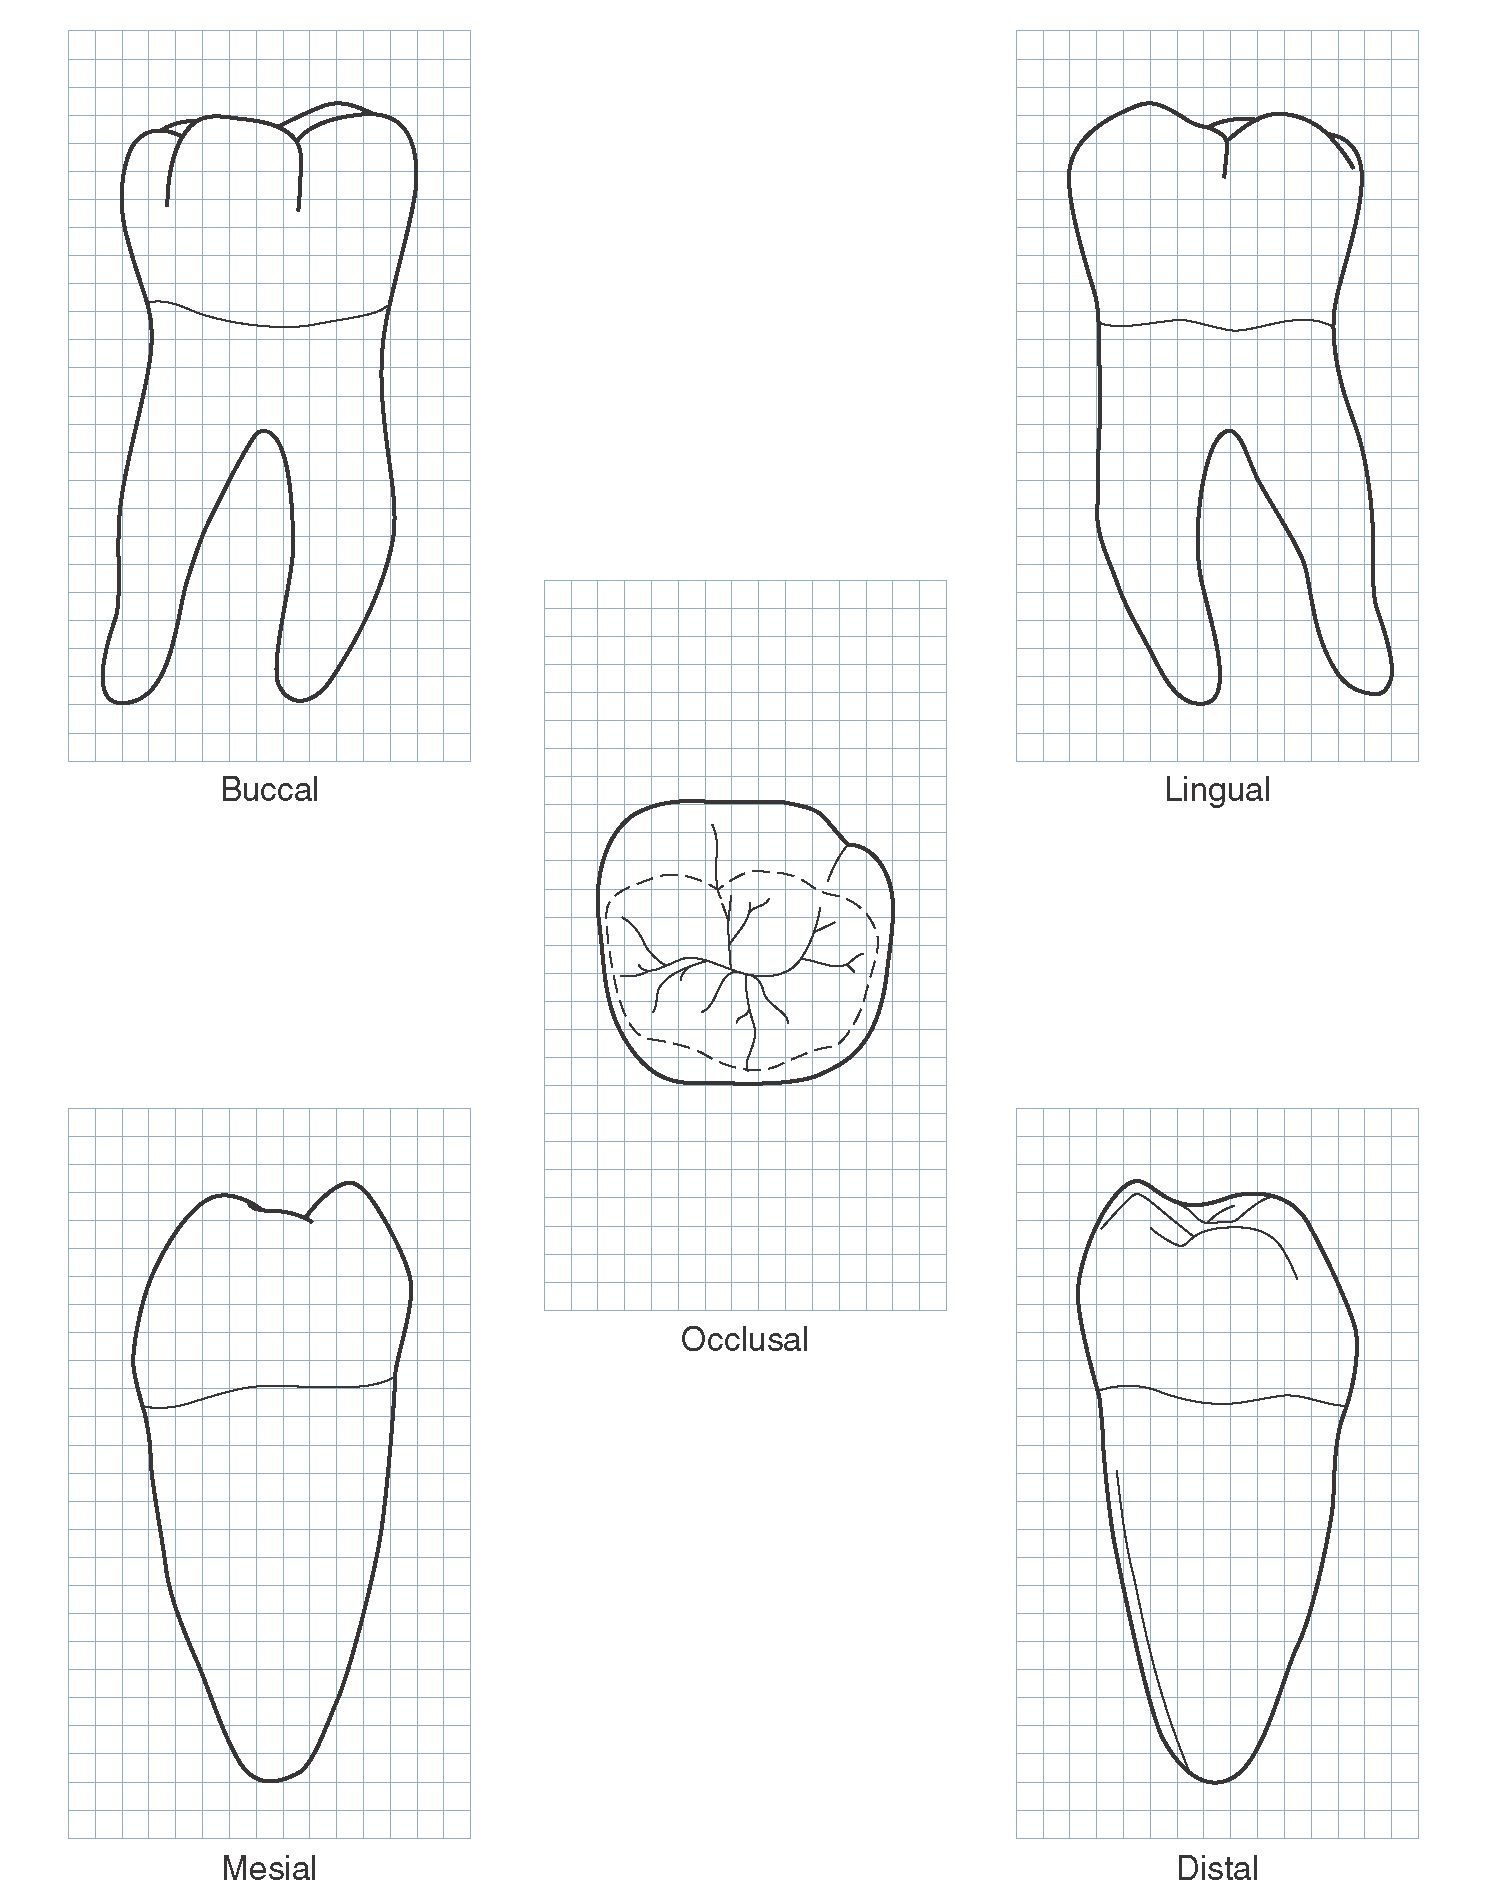 The Permanent Mandibular Molars Dental Anatomy